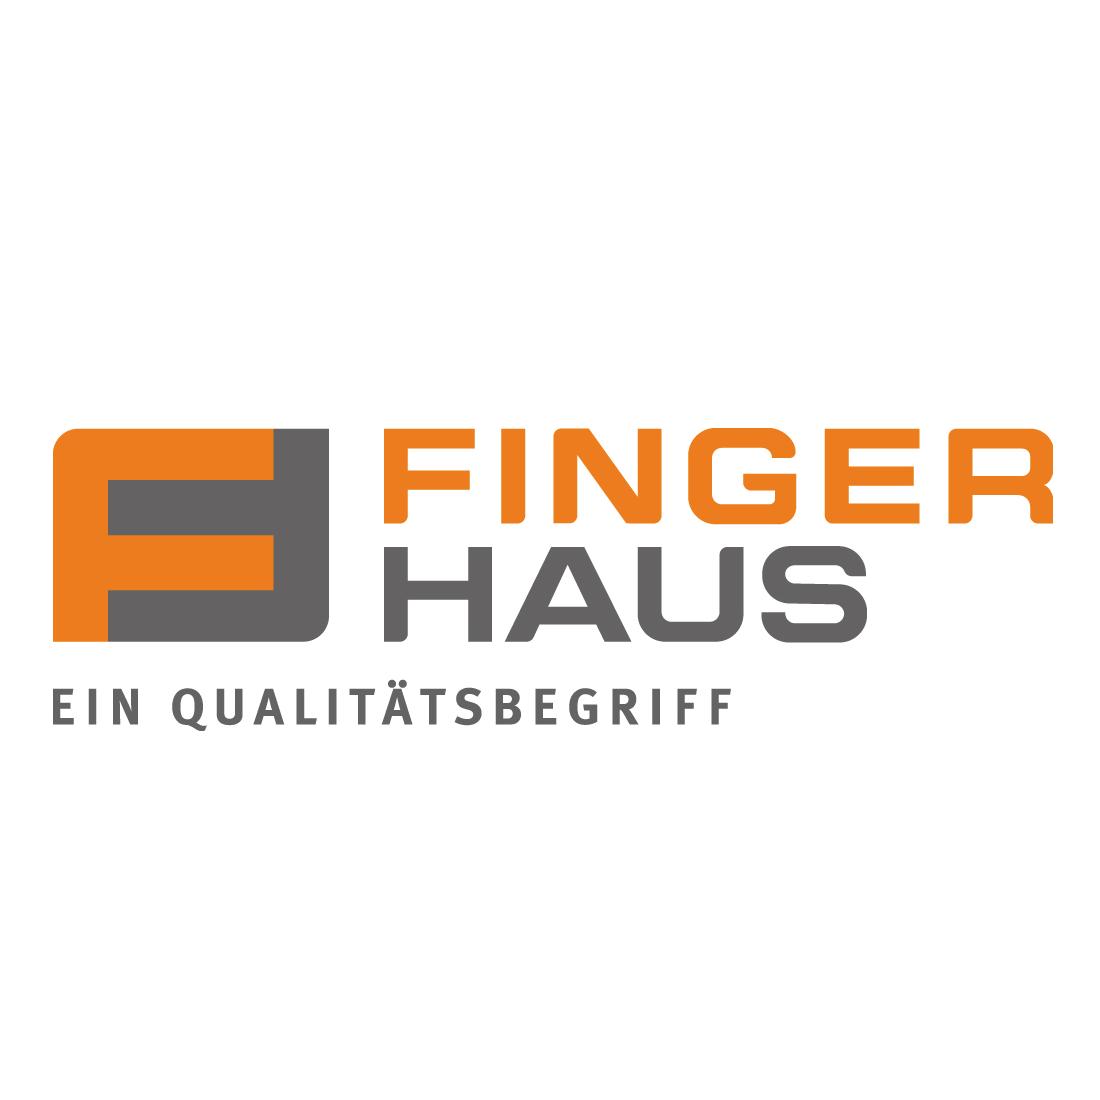 FingerHaus GmbH - Musterhaus Mannheim Logo